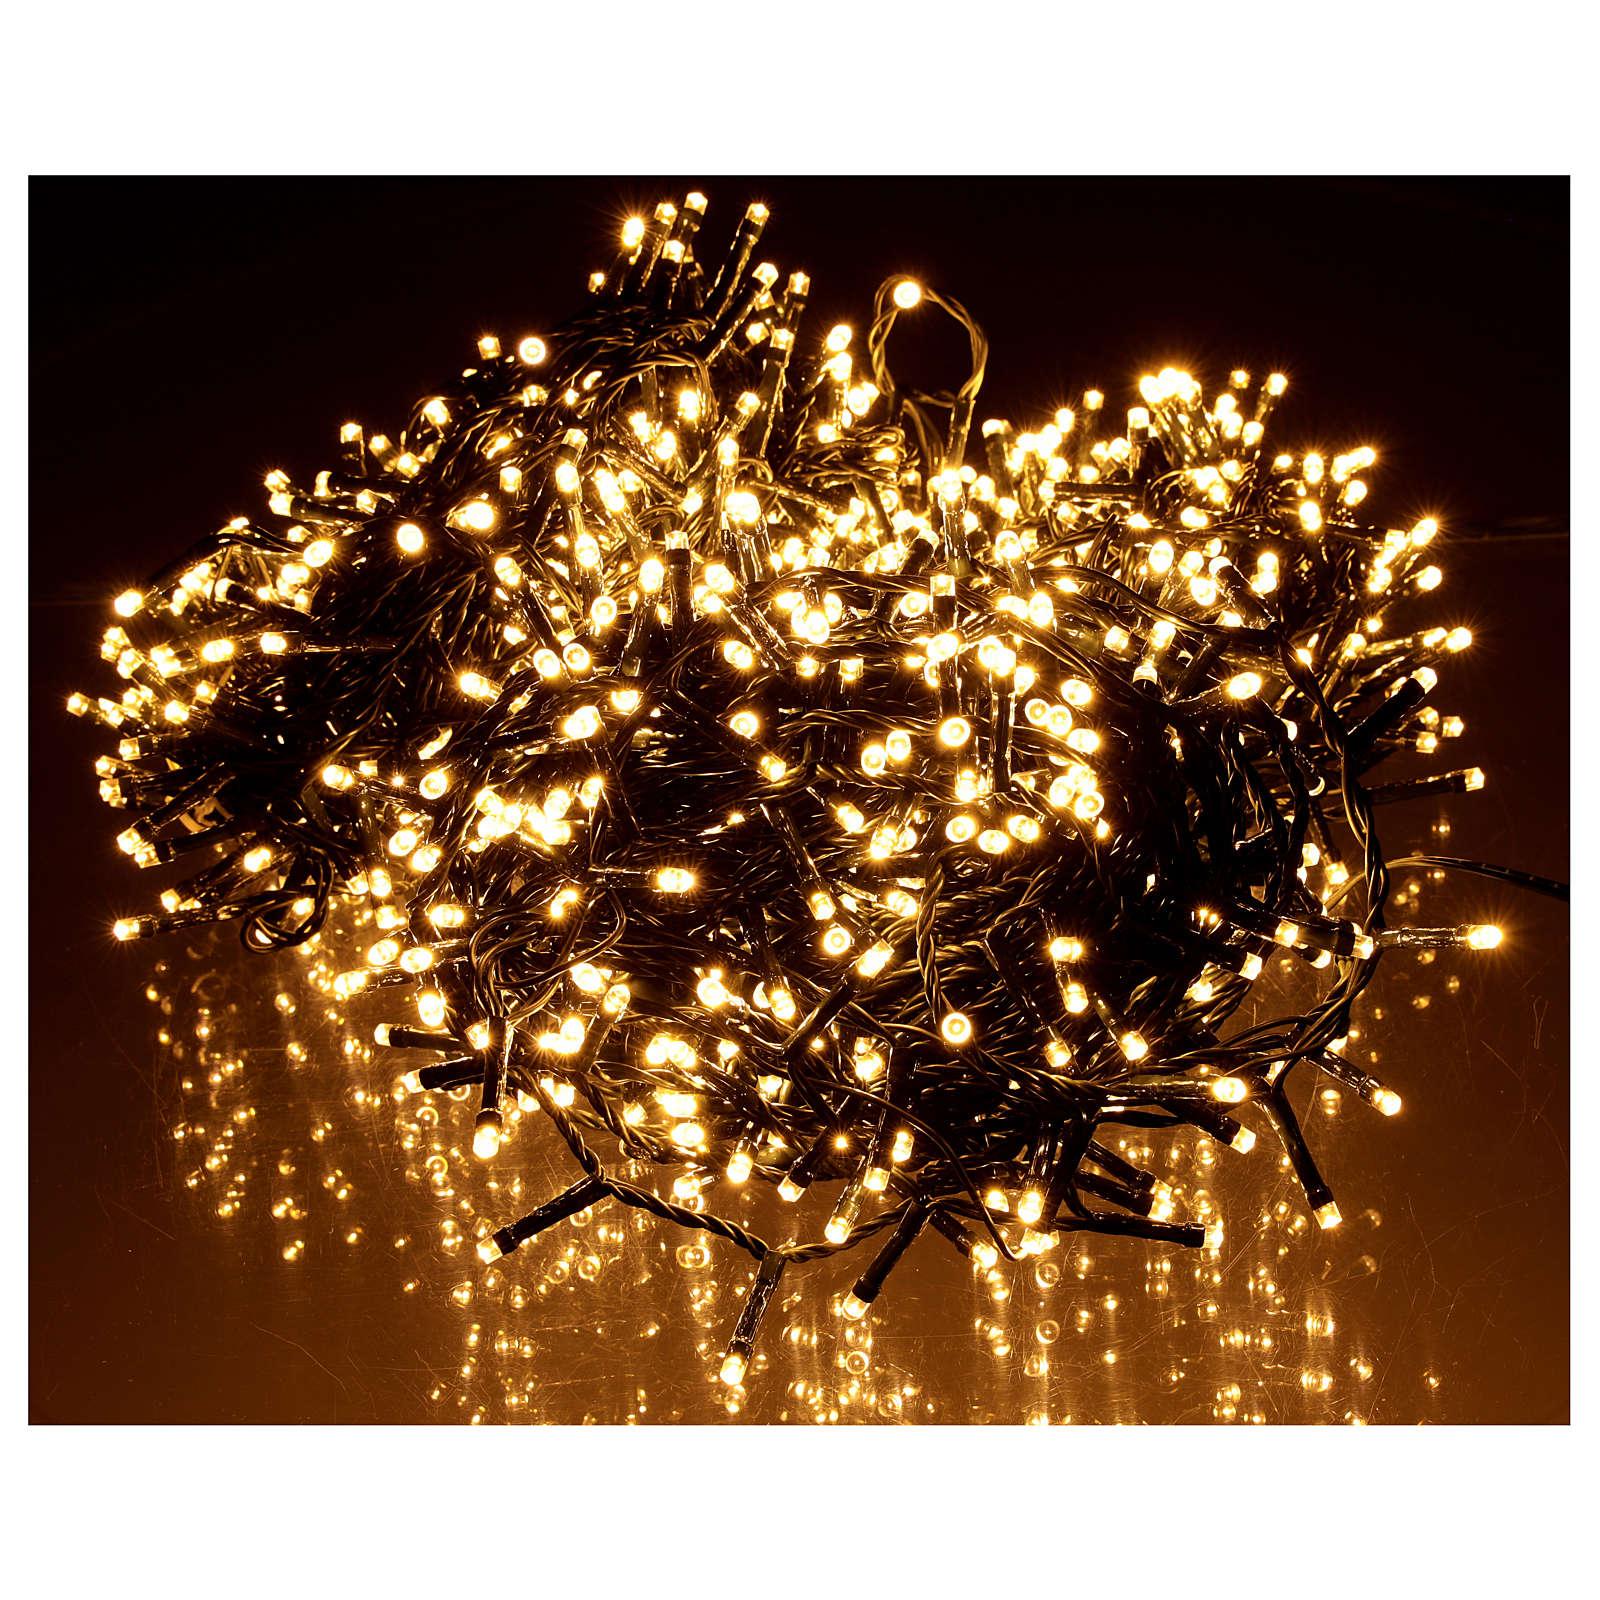 Catena luminosa Natale 1200 led bianco caldo esterno 220V 3